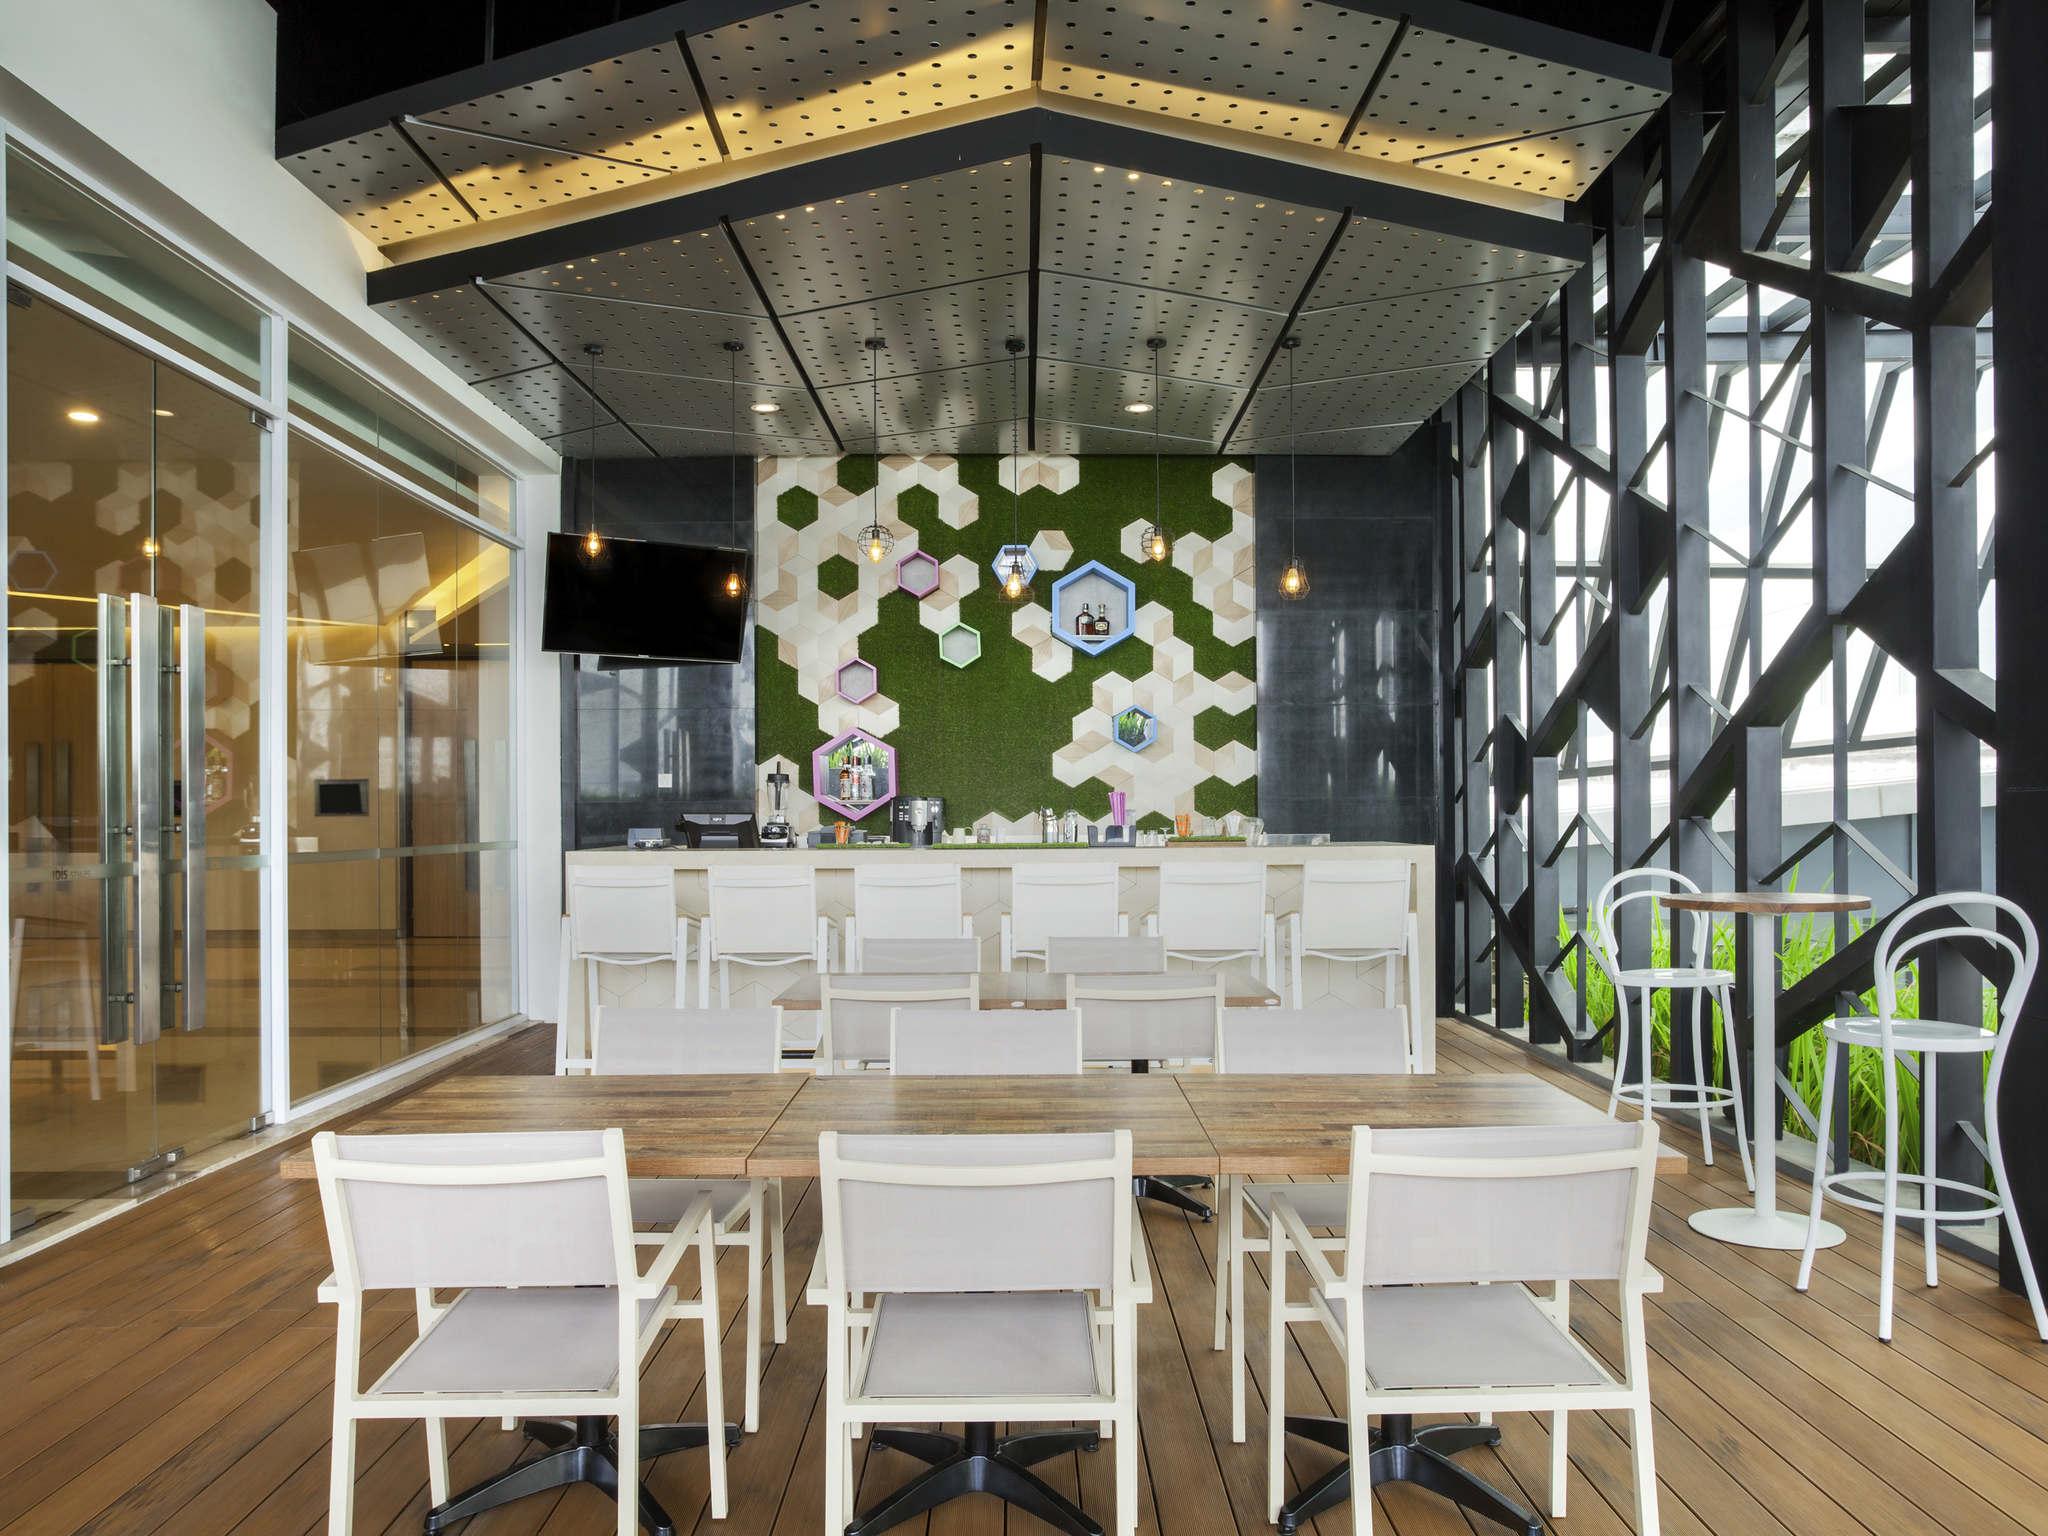 Hotel In Sunter Ibis Styles Jakarta Accorhotels Voucher Carrefour Rp 15000000 Bar